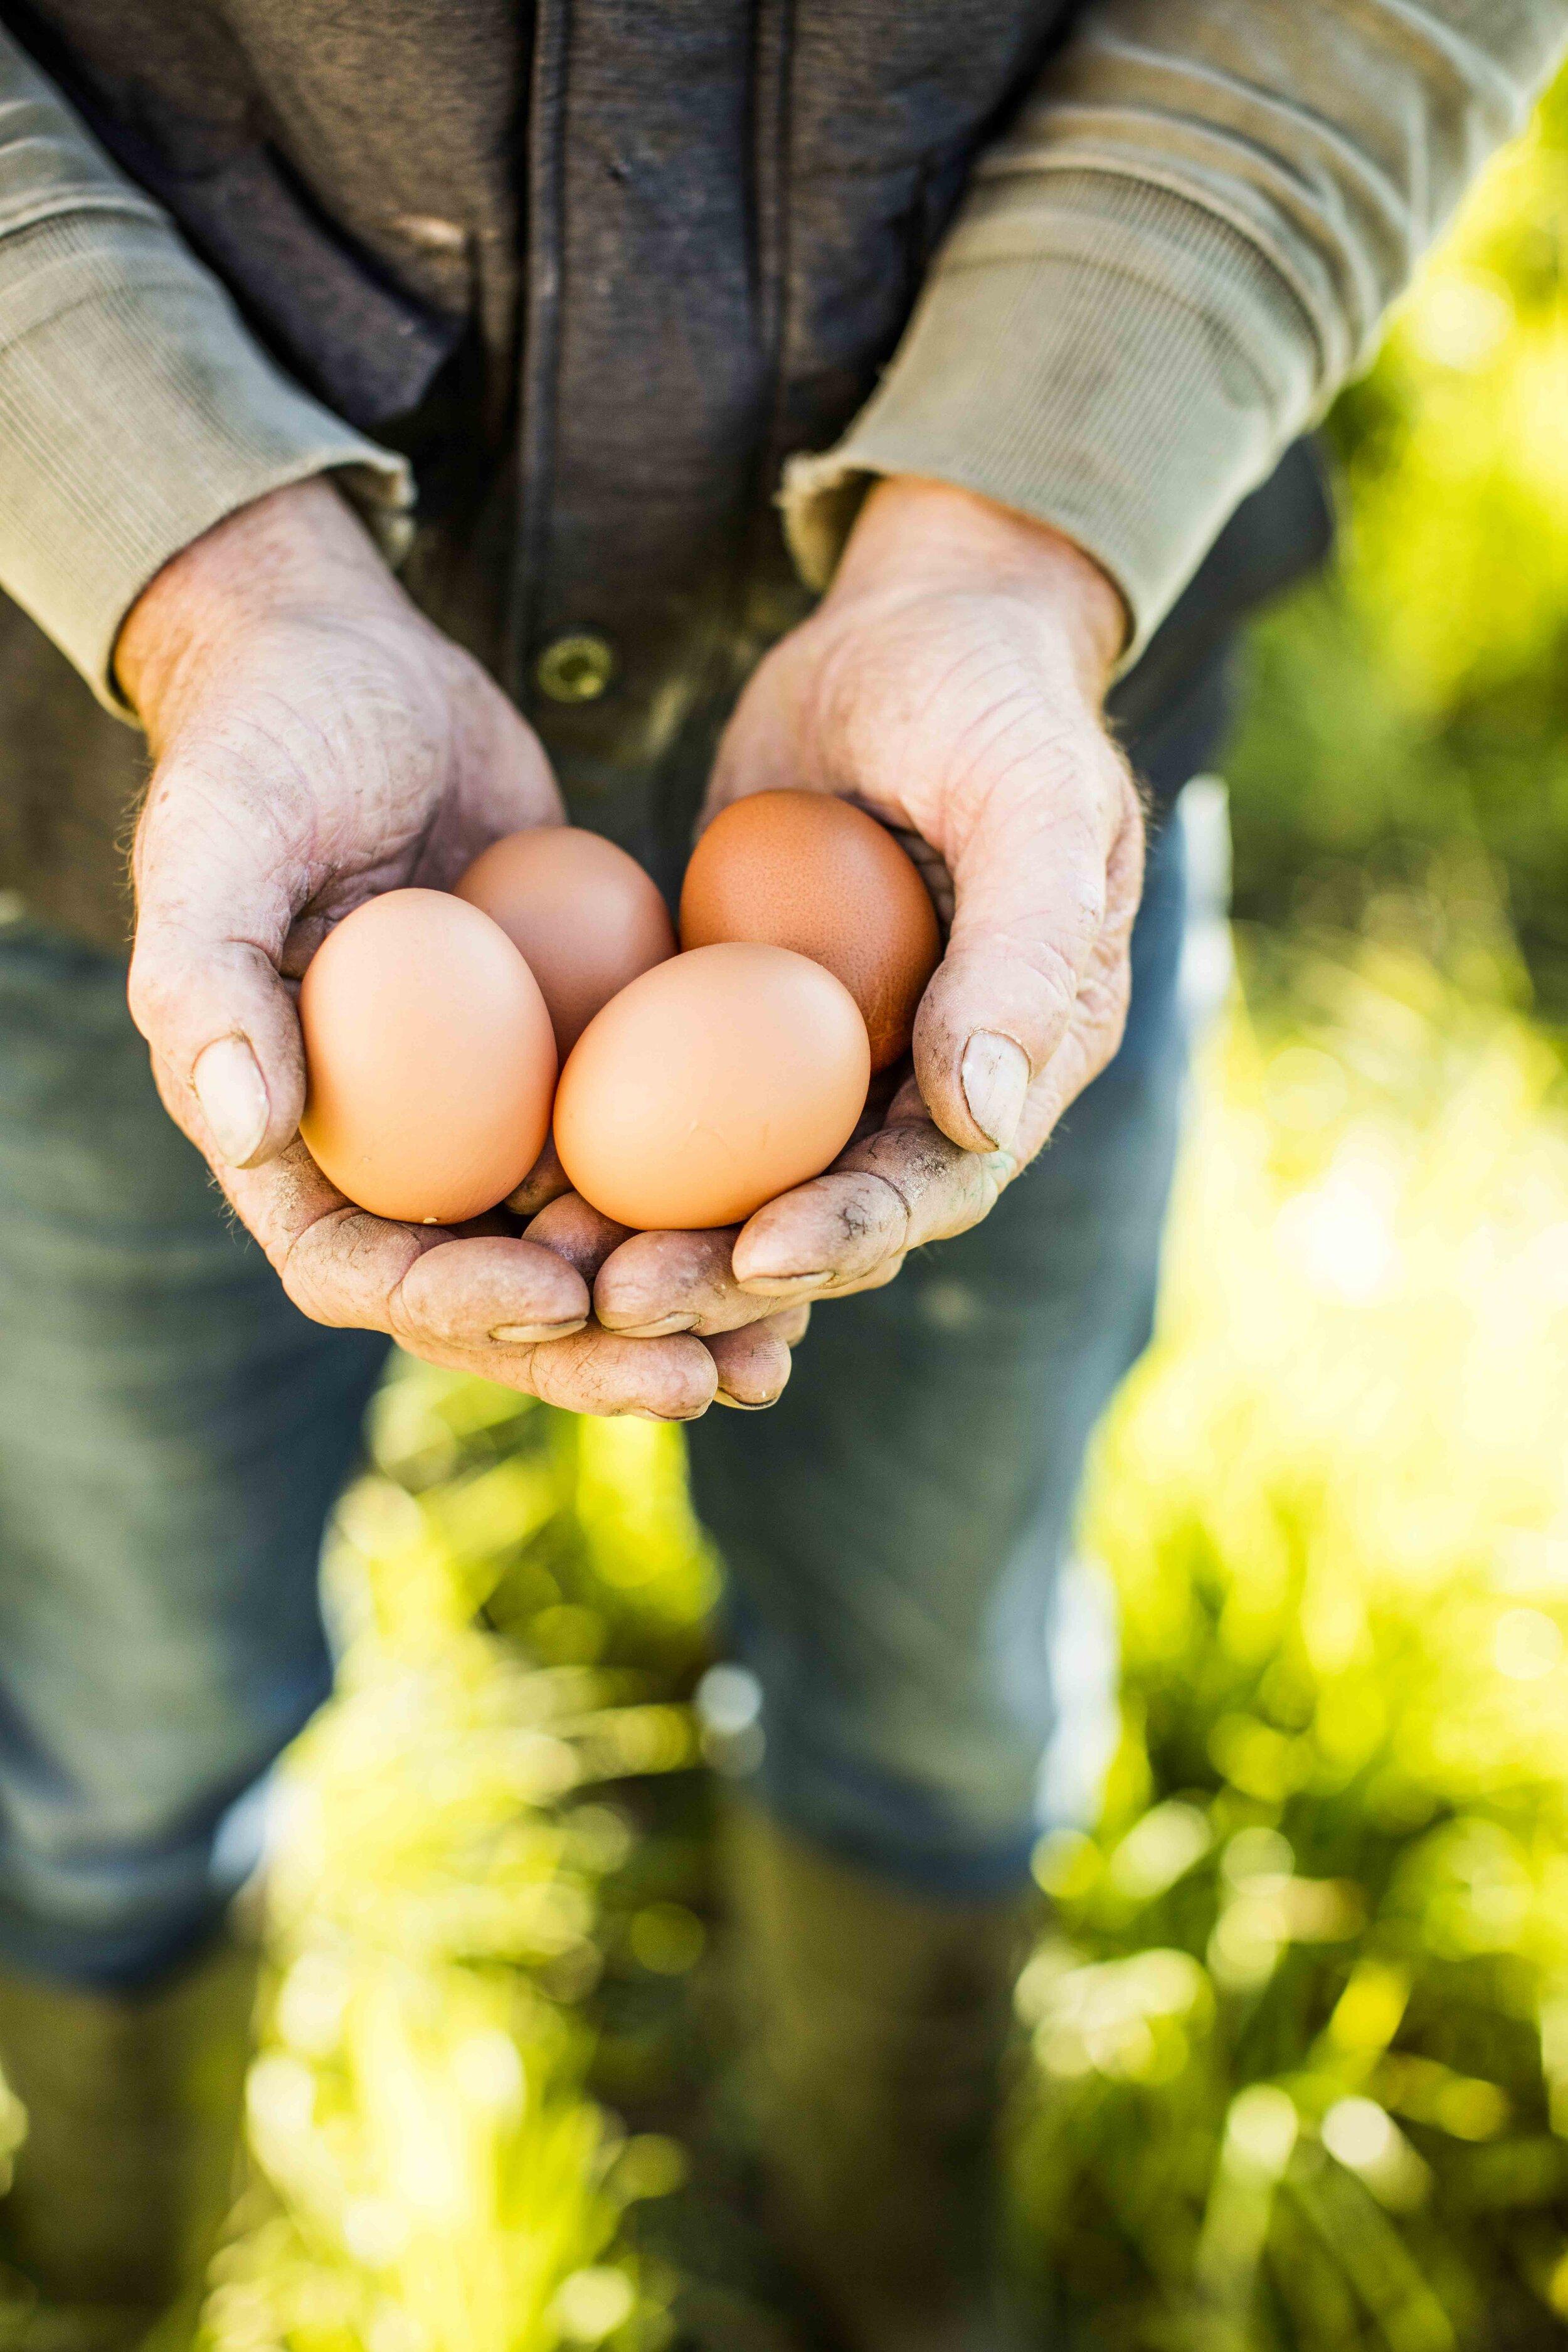 eggs in hand.JPG